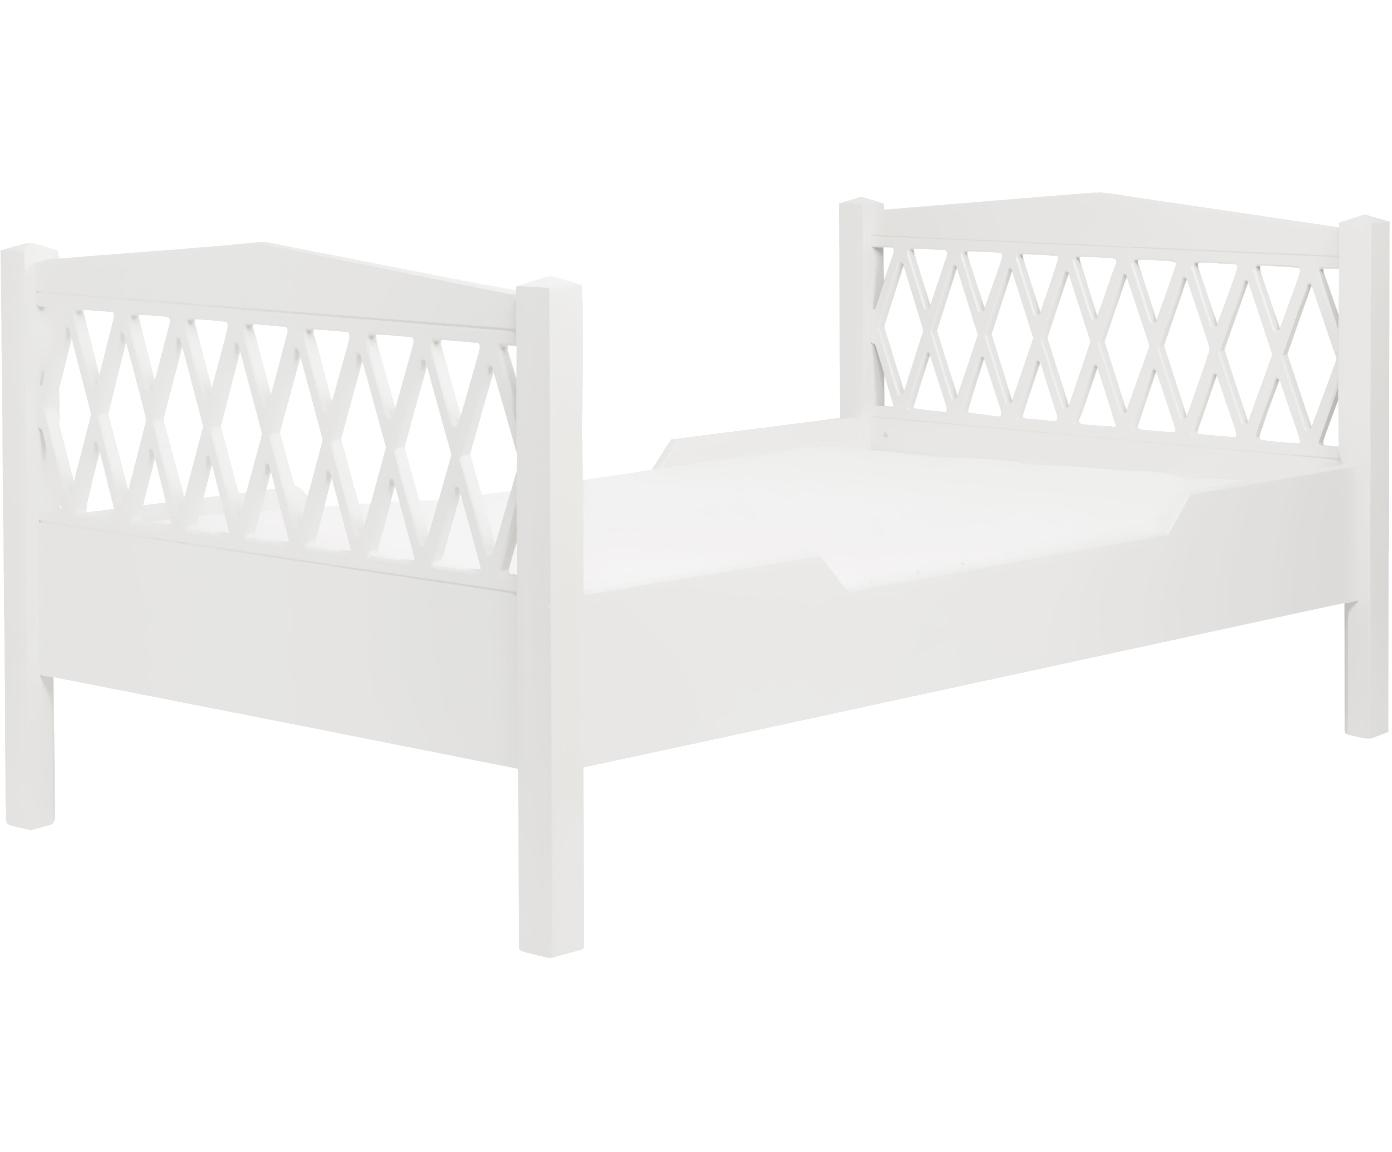 Kinderbett Harlequin, Holz, lackiert, Weiß, 100 x 170 cm